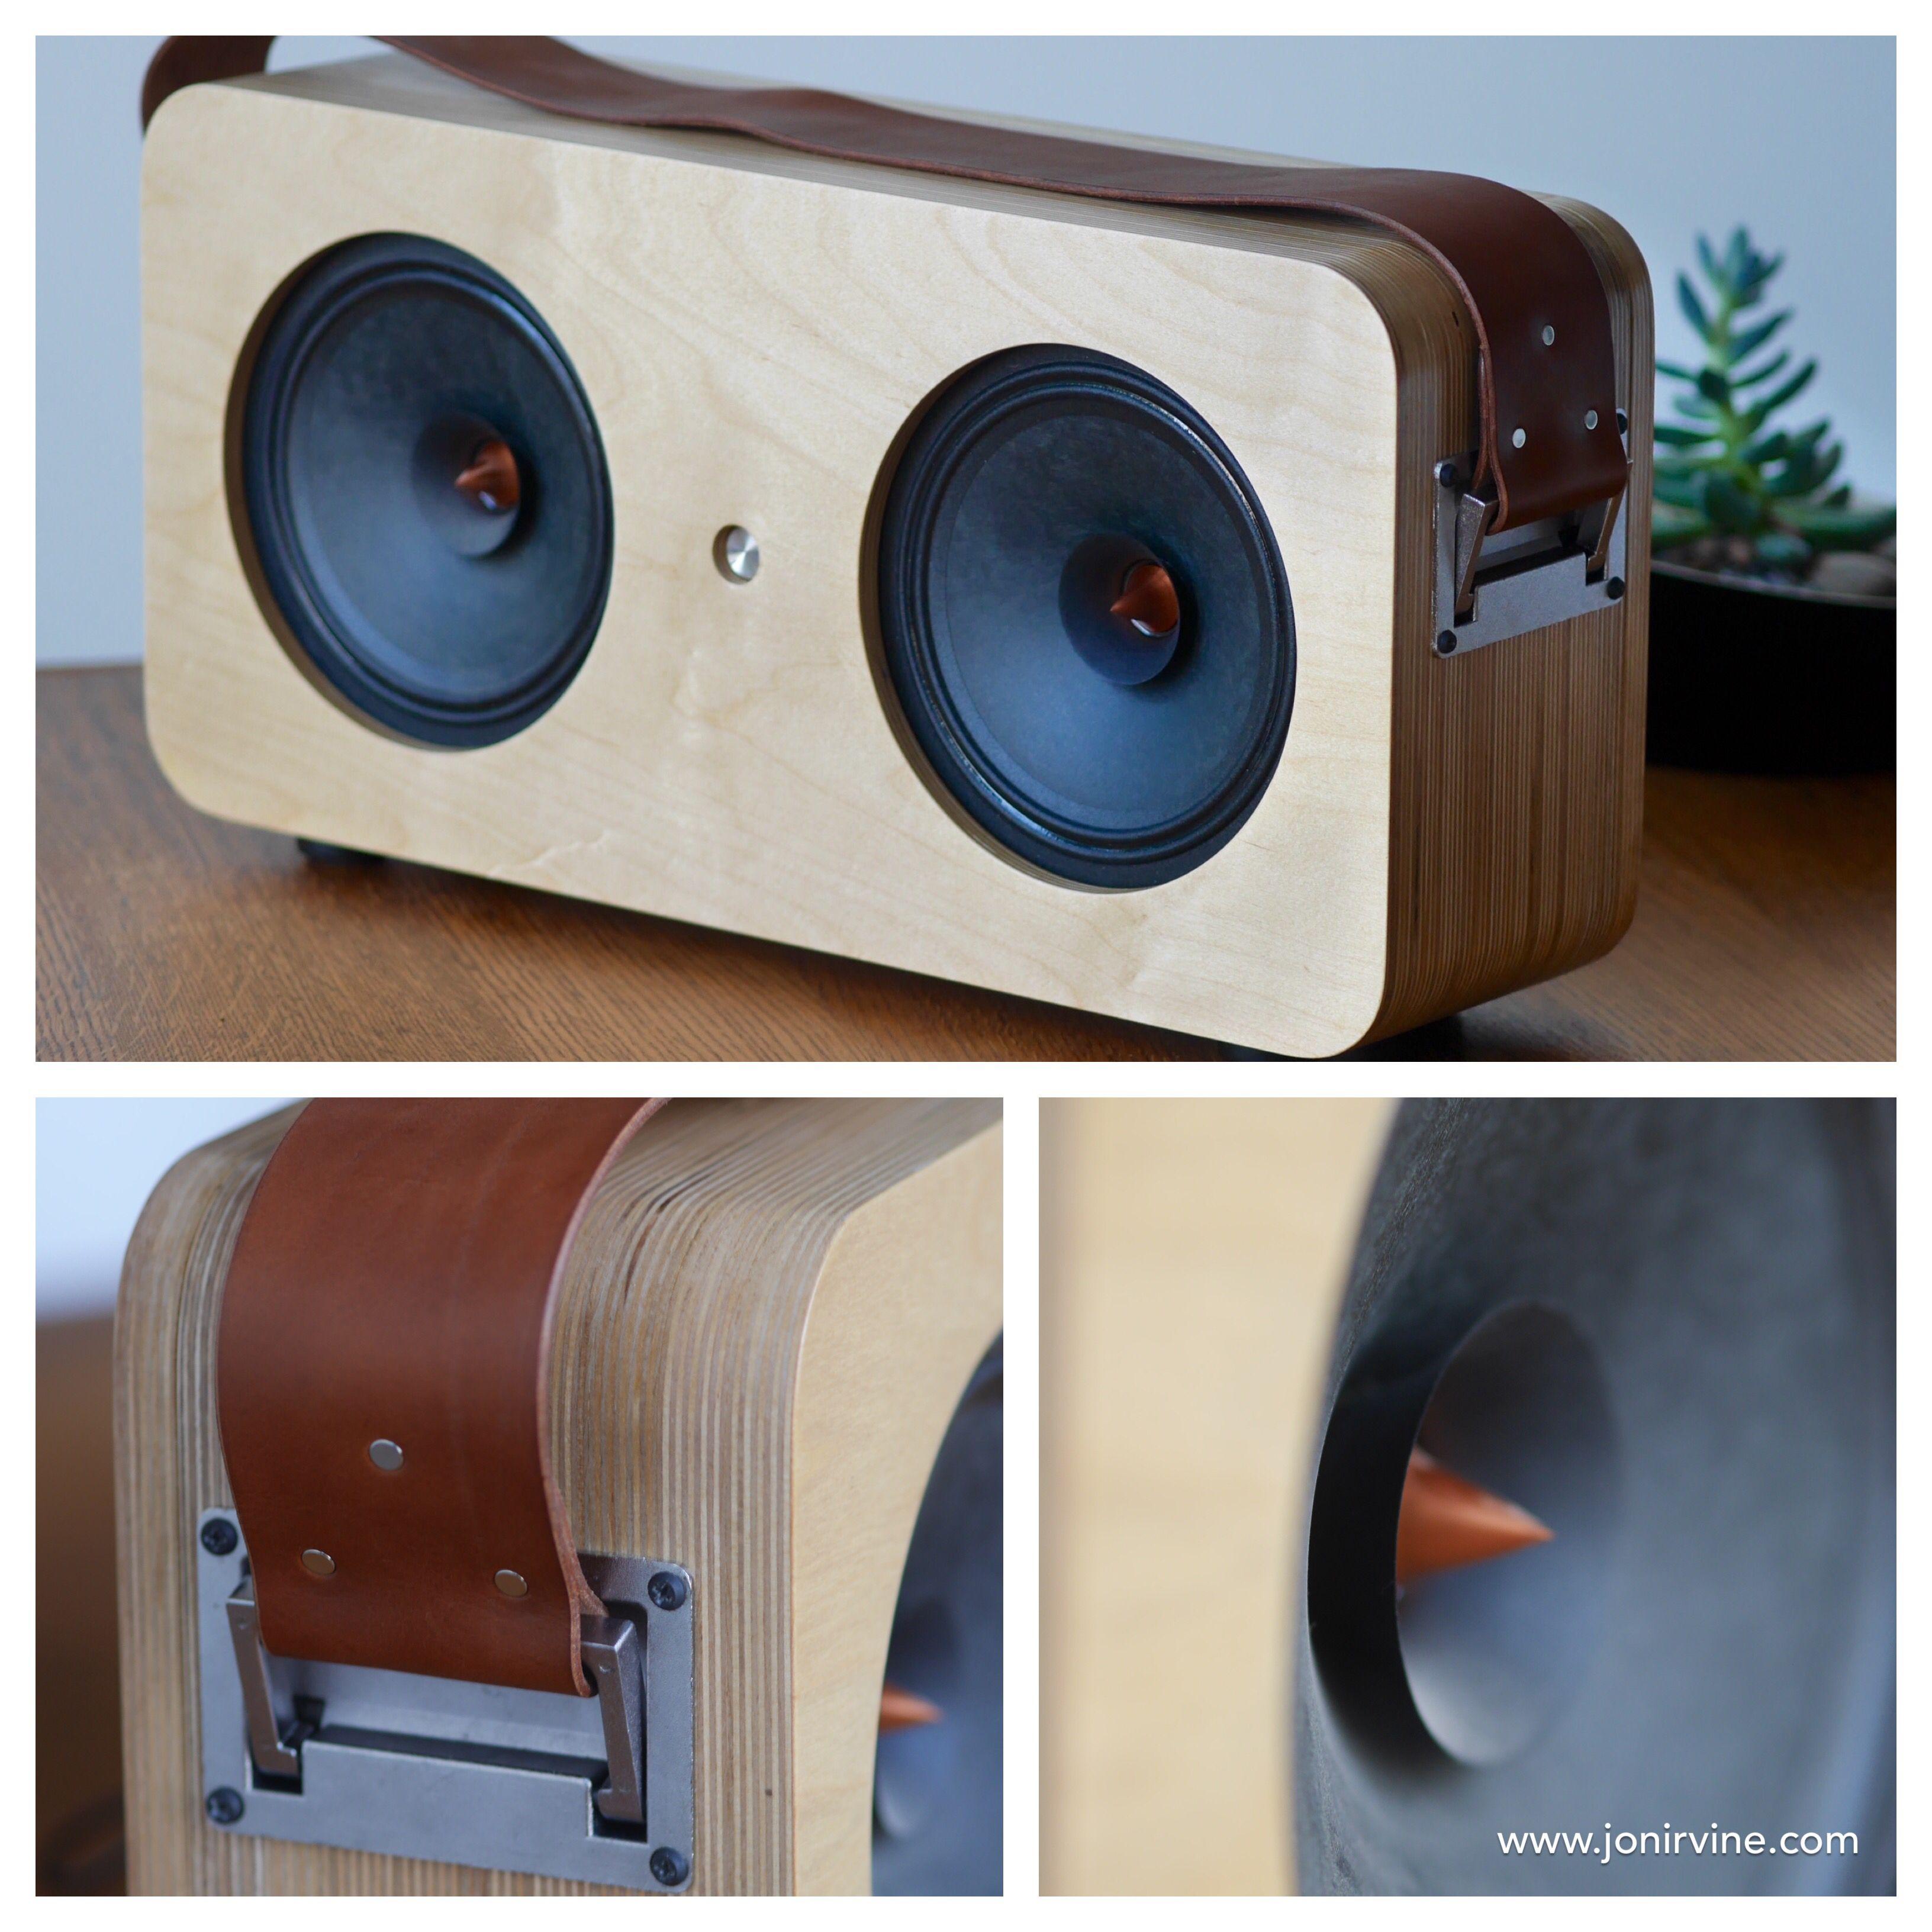 Diy Boombox Designed By Jon Irvine Diyaudio Boombox